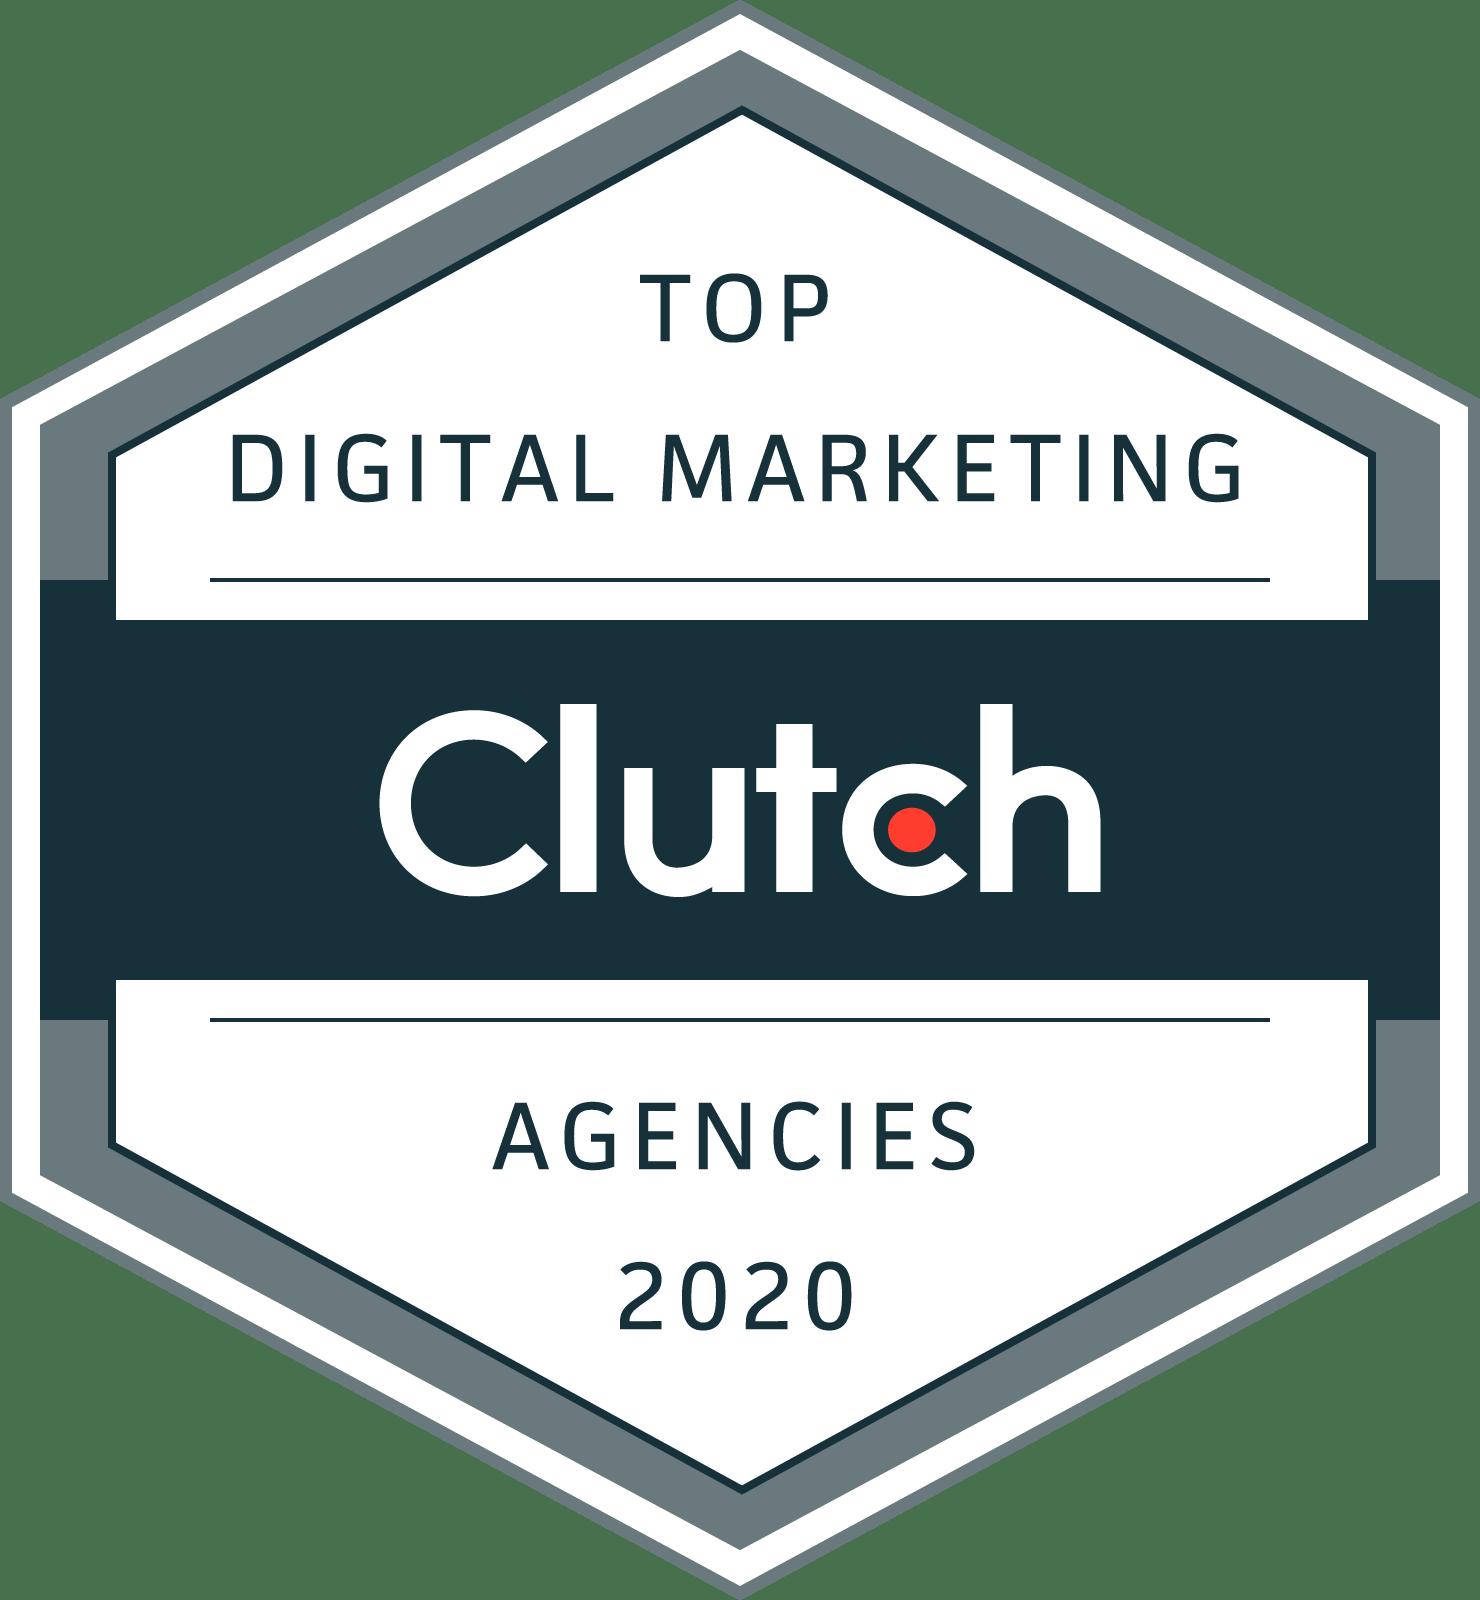 Digital_Marketing_Agencies_2020